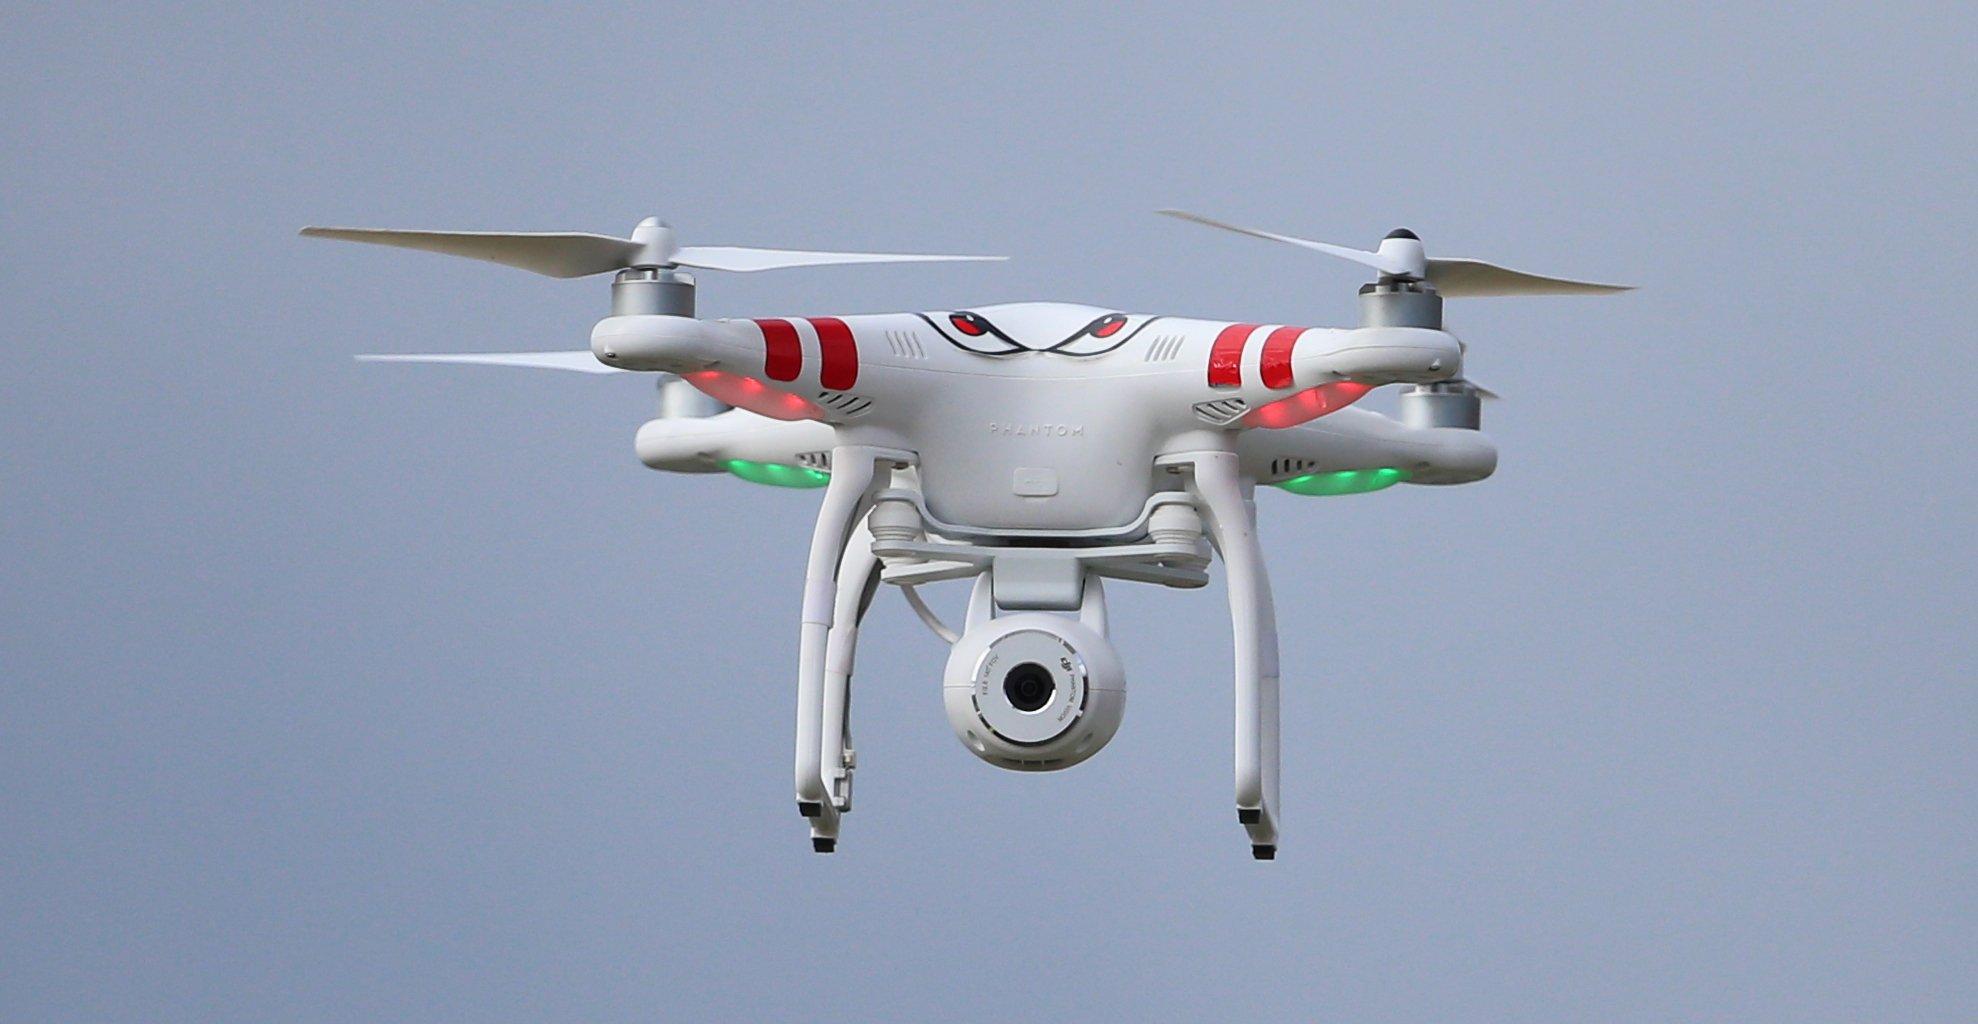 The New Drone Killer Blasts of U.S. Targets